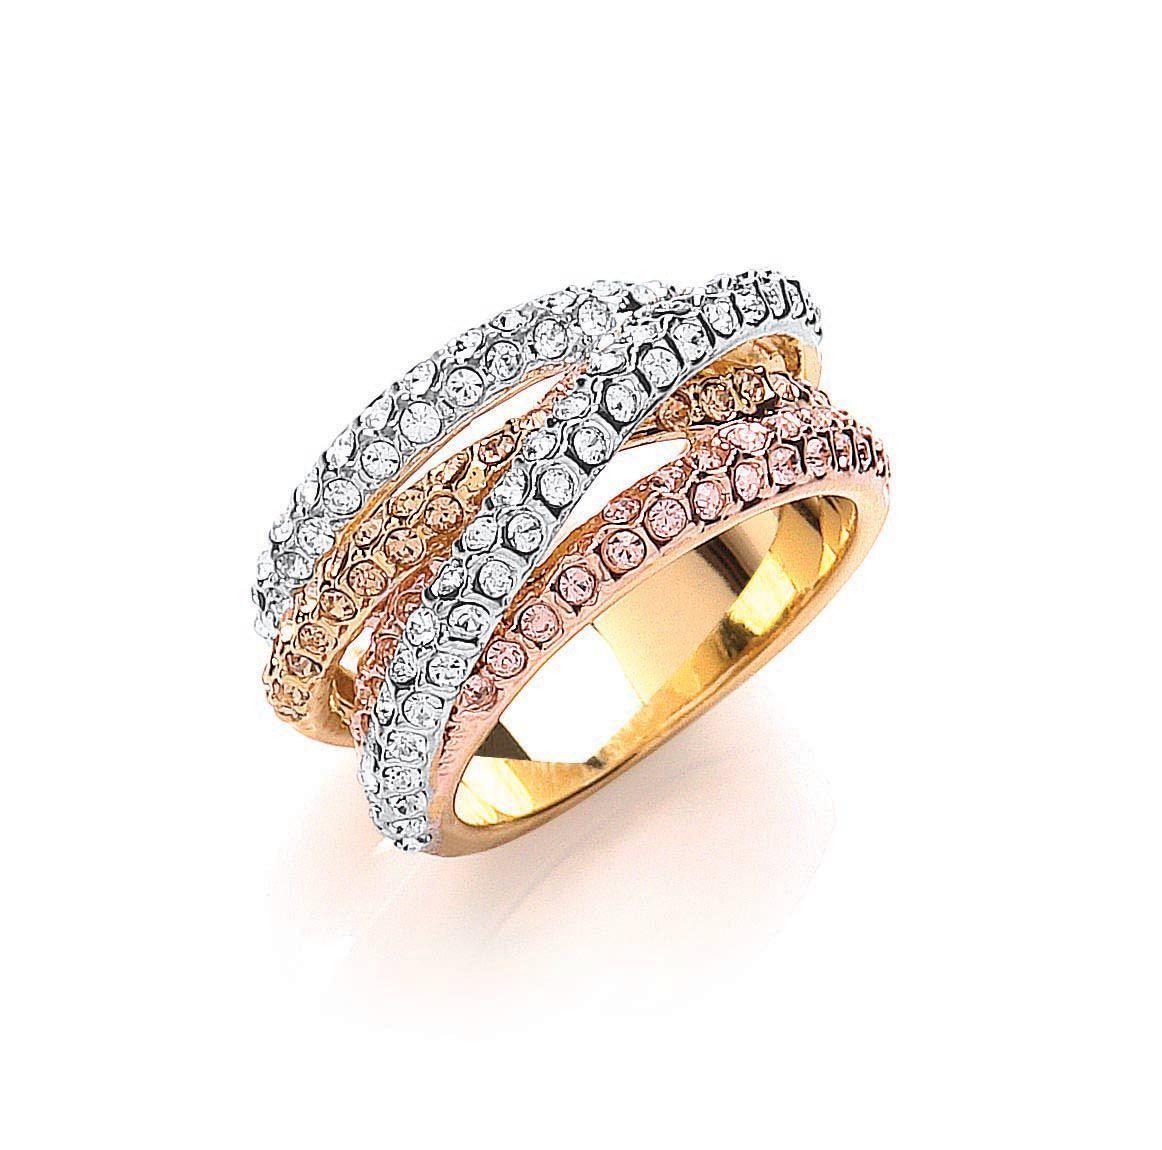 Buckley London Russian Trio Jewellery Sparkle Strands Ring